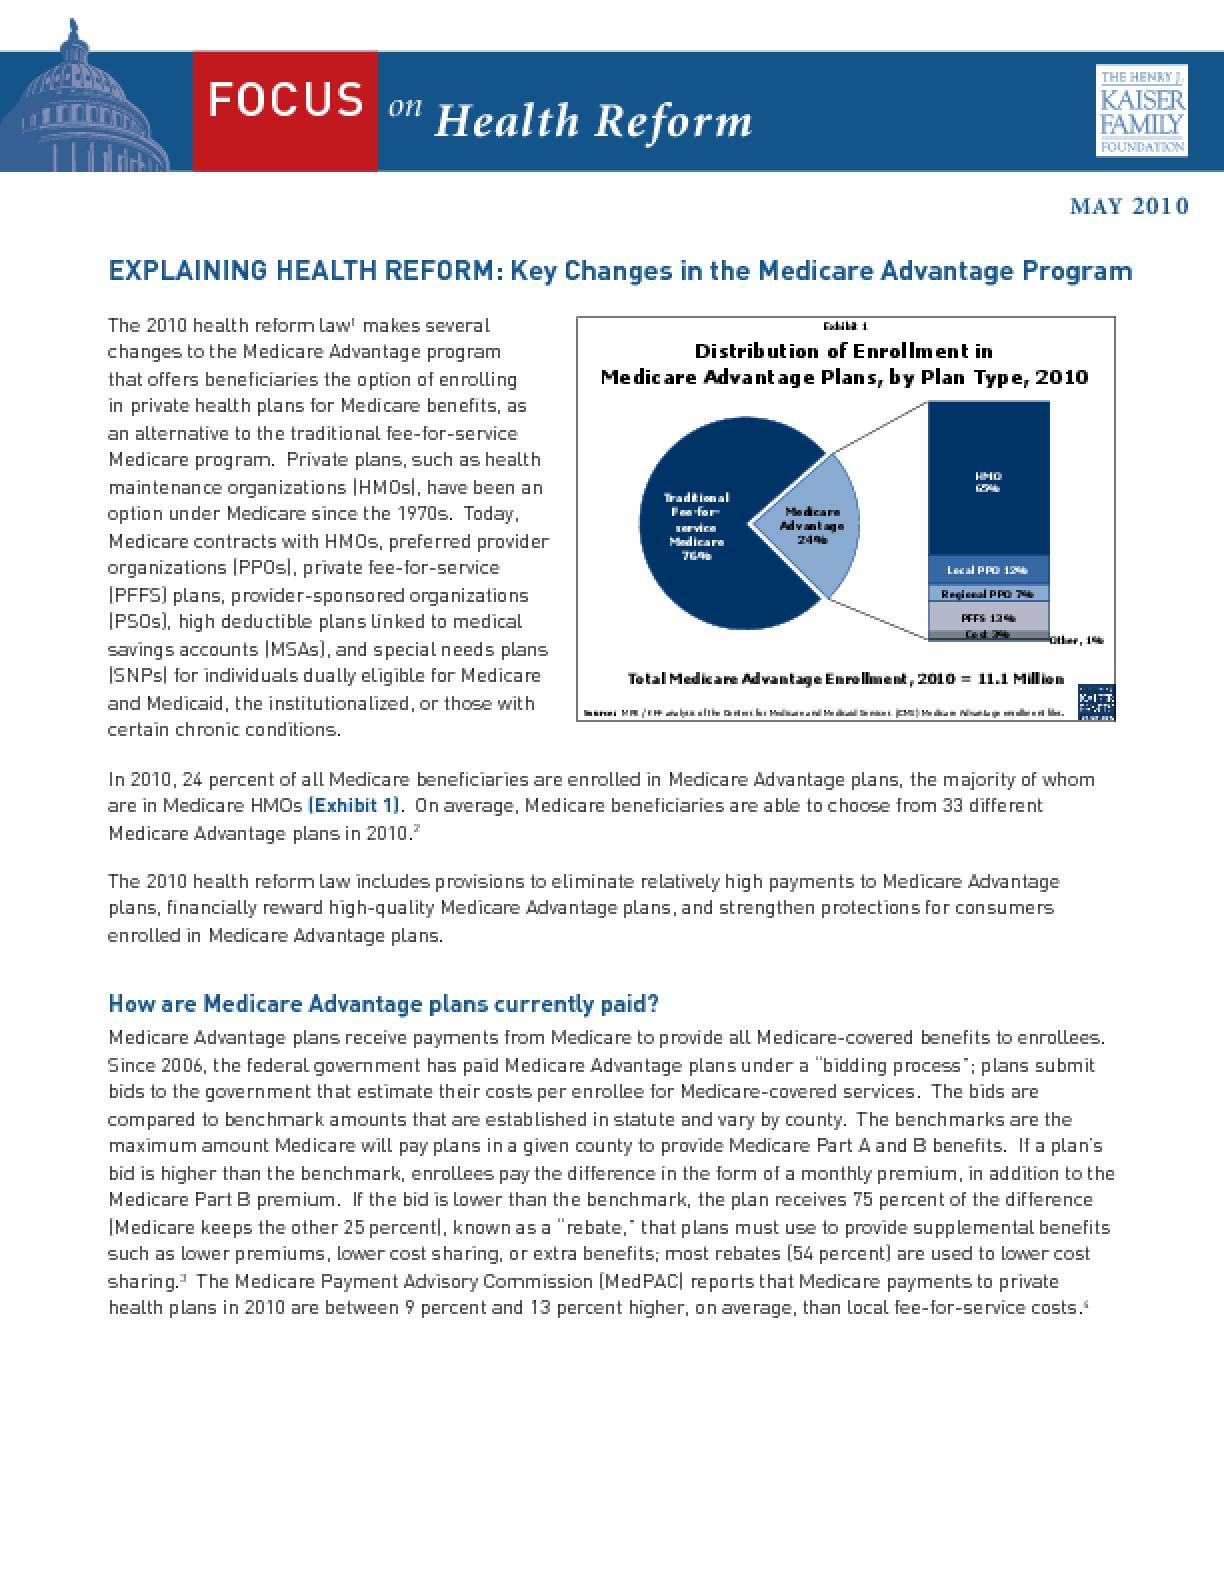 Explaining Health Reform: Key Changes in the Medicare Advantage Program